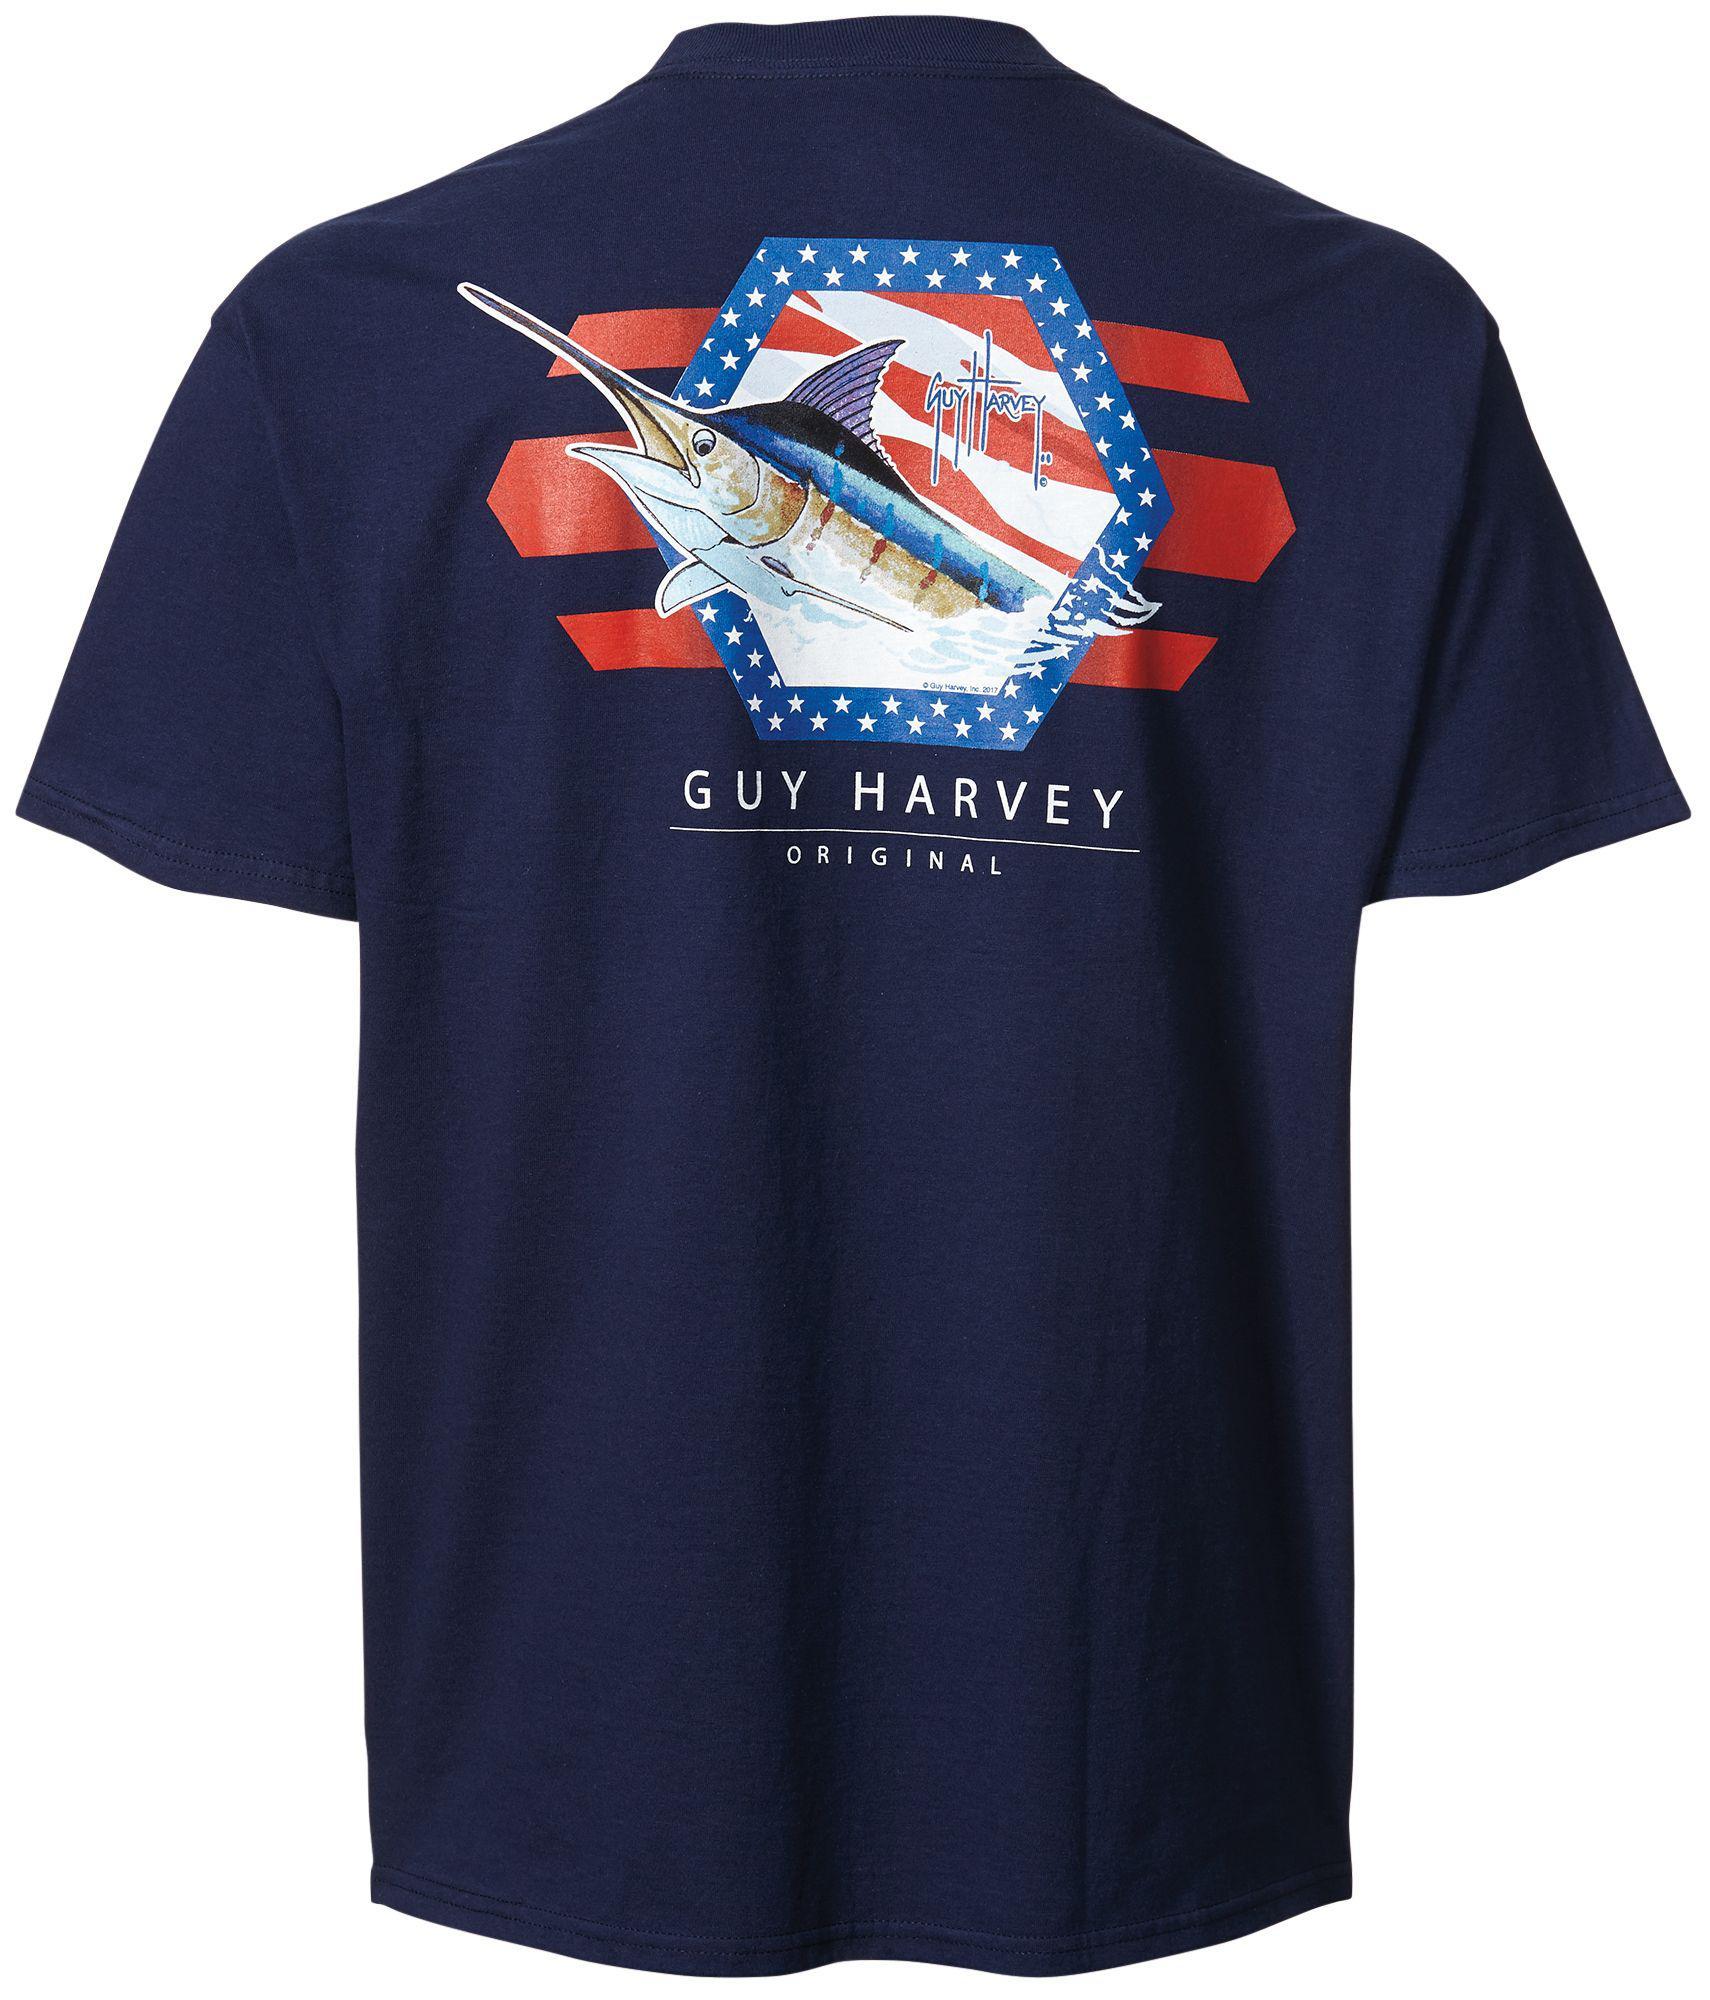 1bfcbe8bd51b Guy Harvey - Blue Resolution Short Sleeve T-shirt for Men - Lyst. View  fullscreen